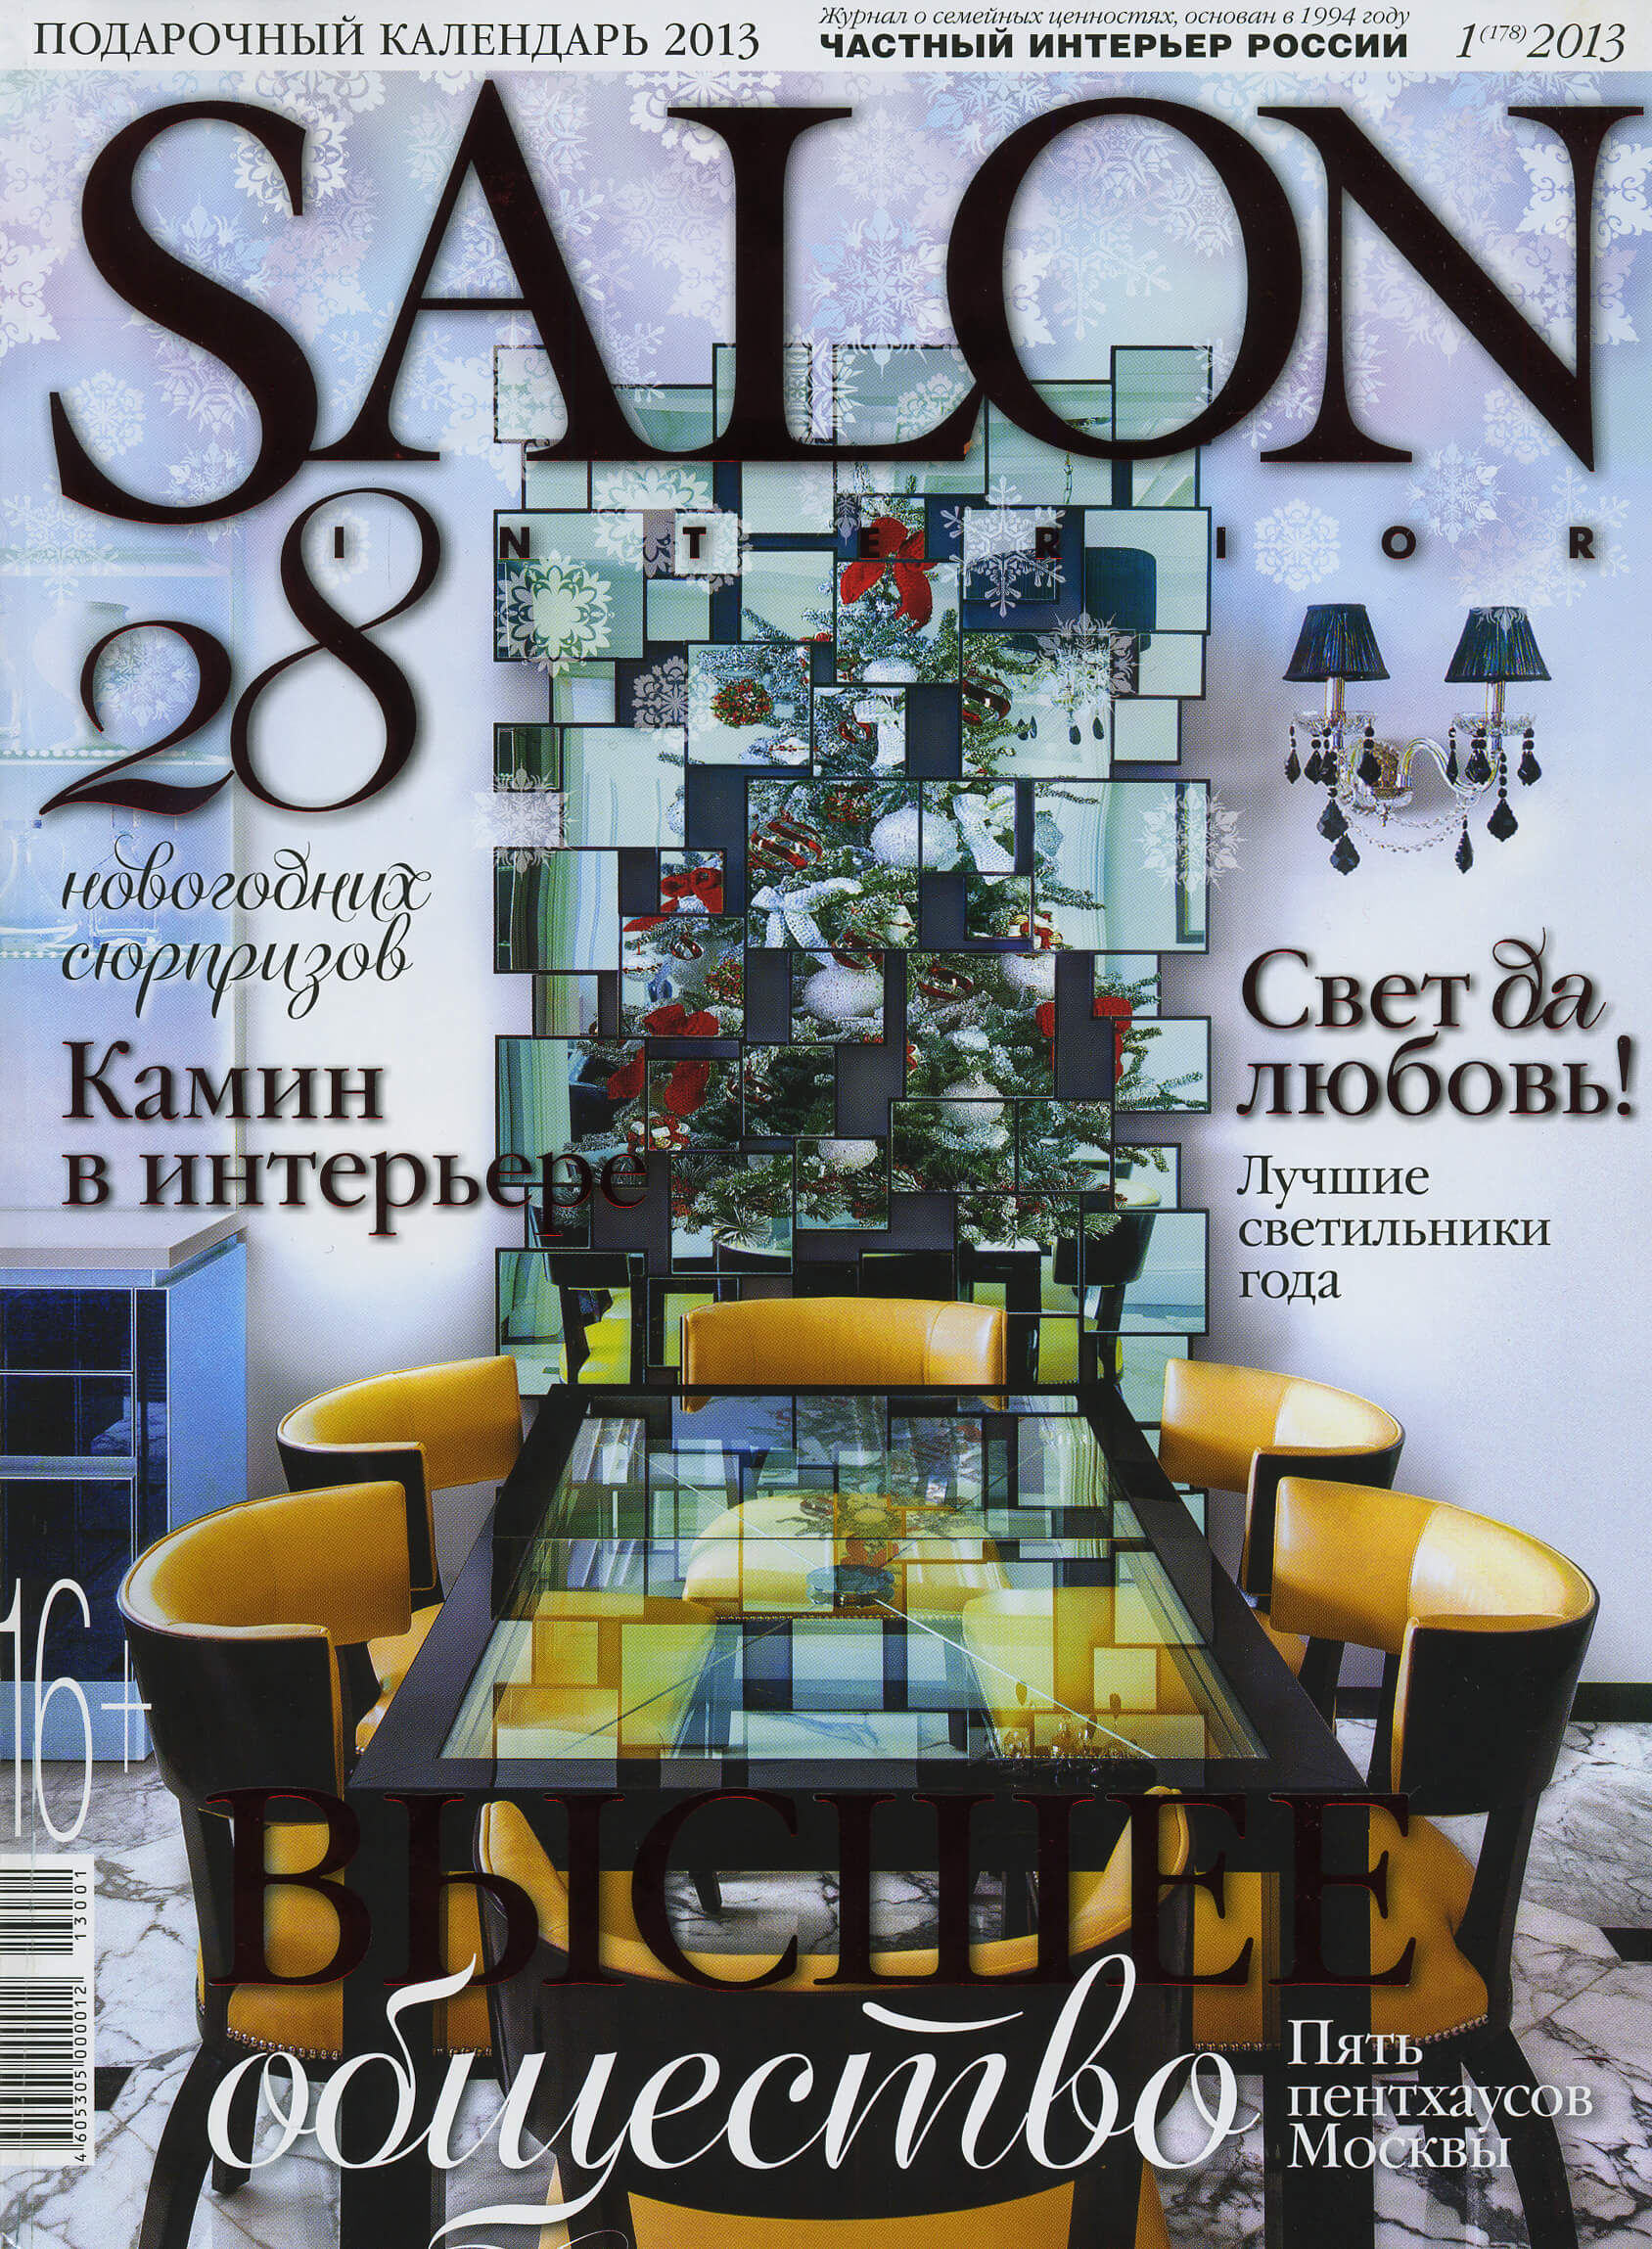 Salon 1 (178) 2013